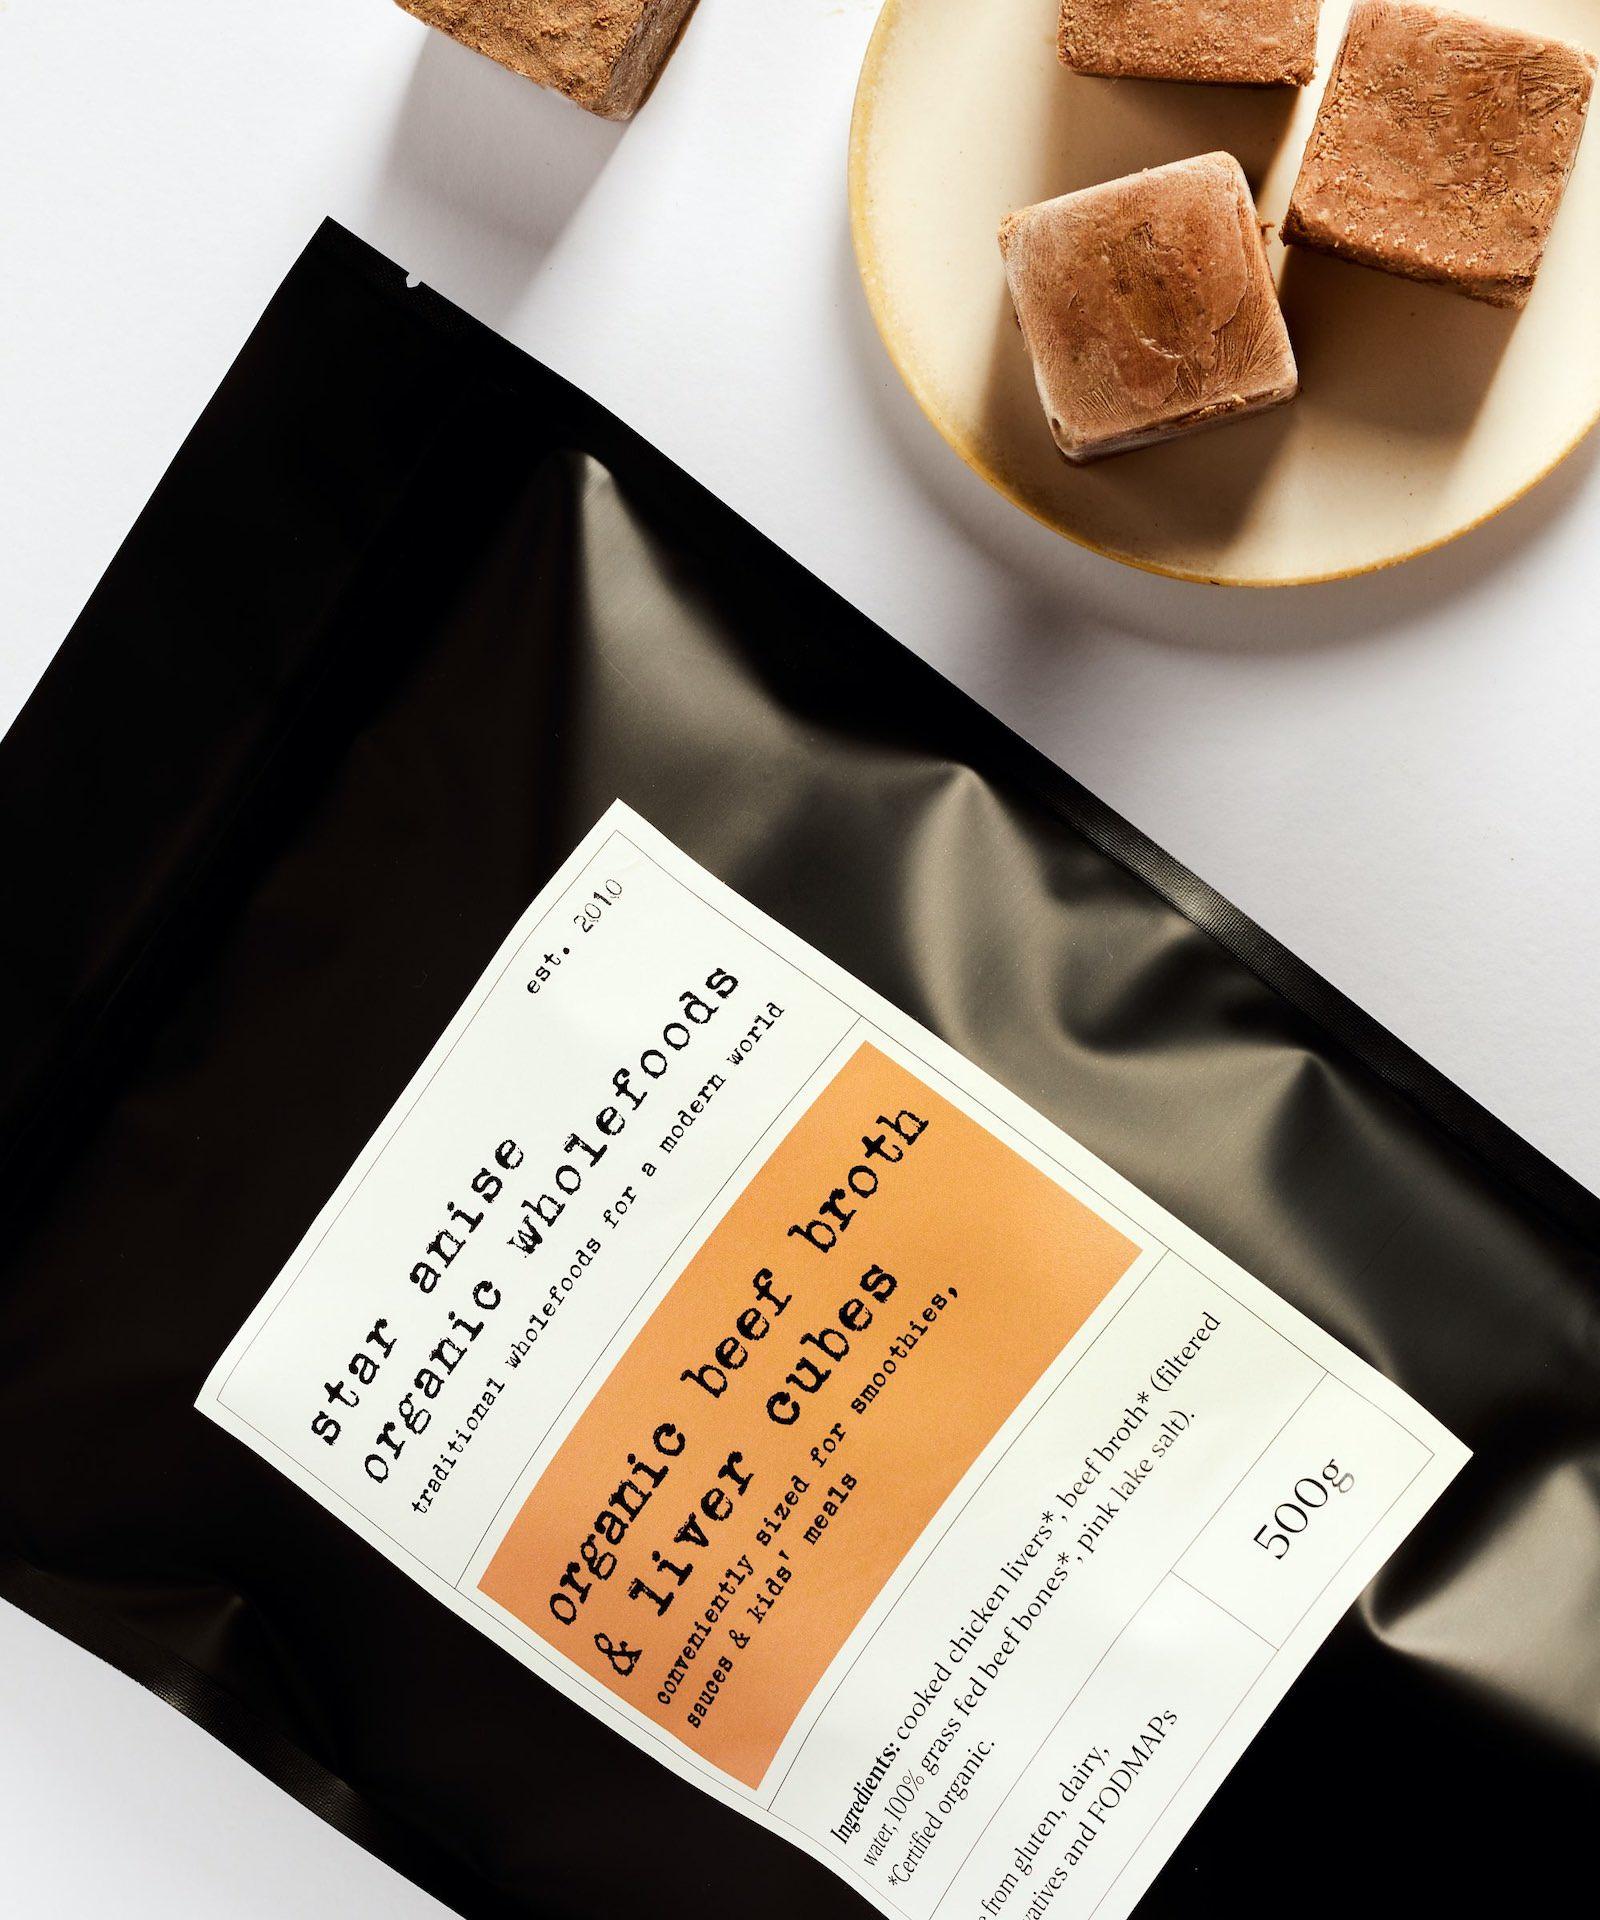 Star Anise Organics packaging